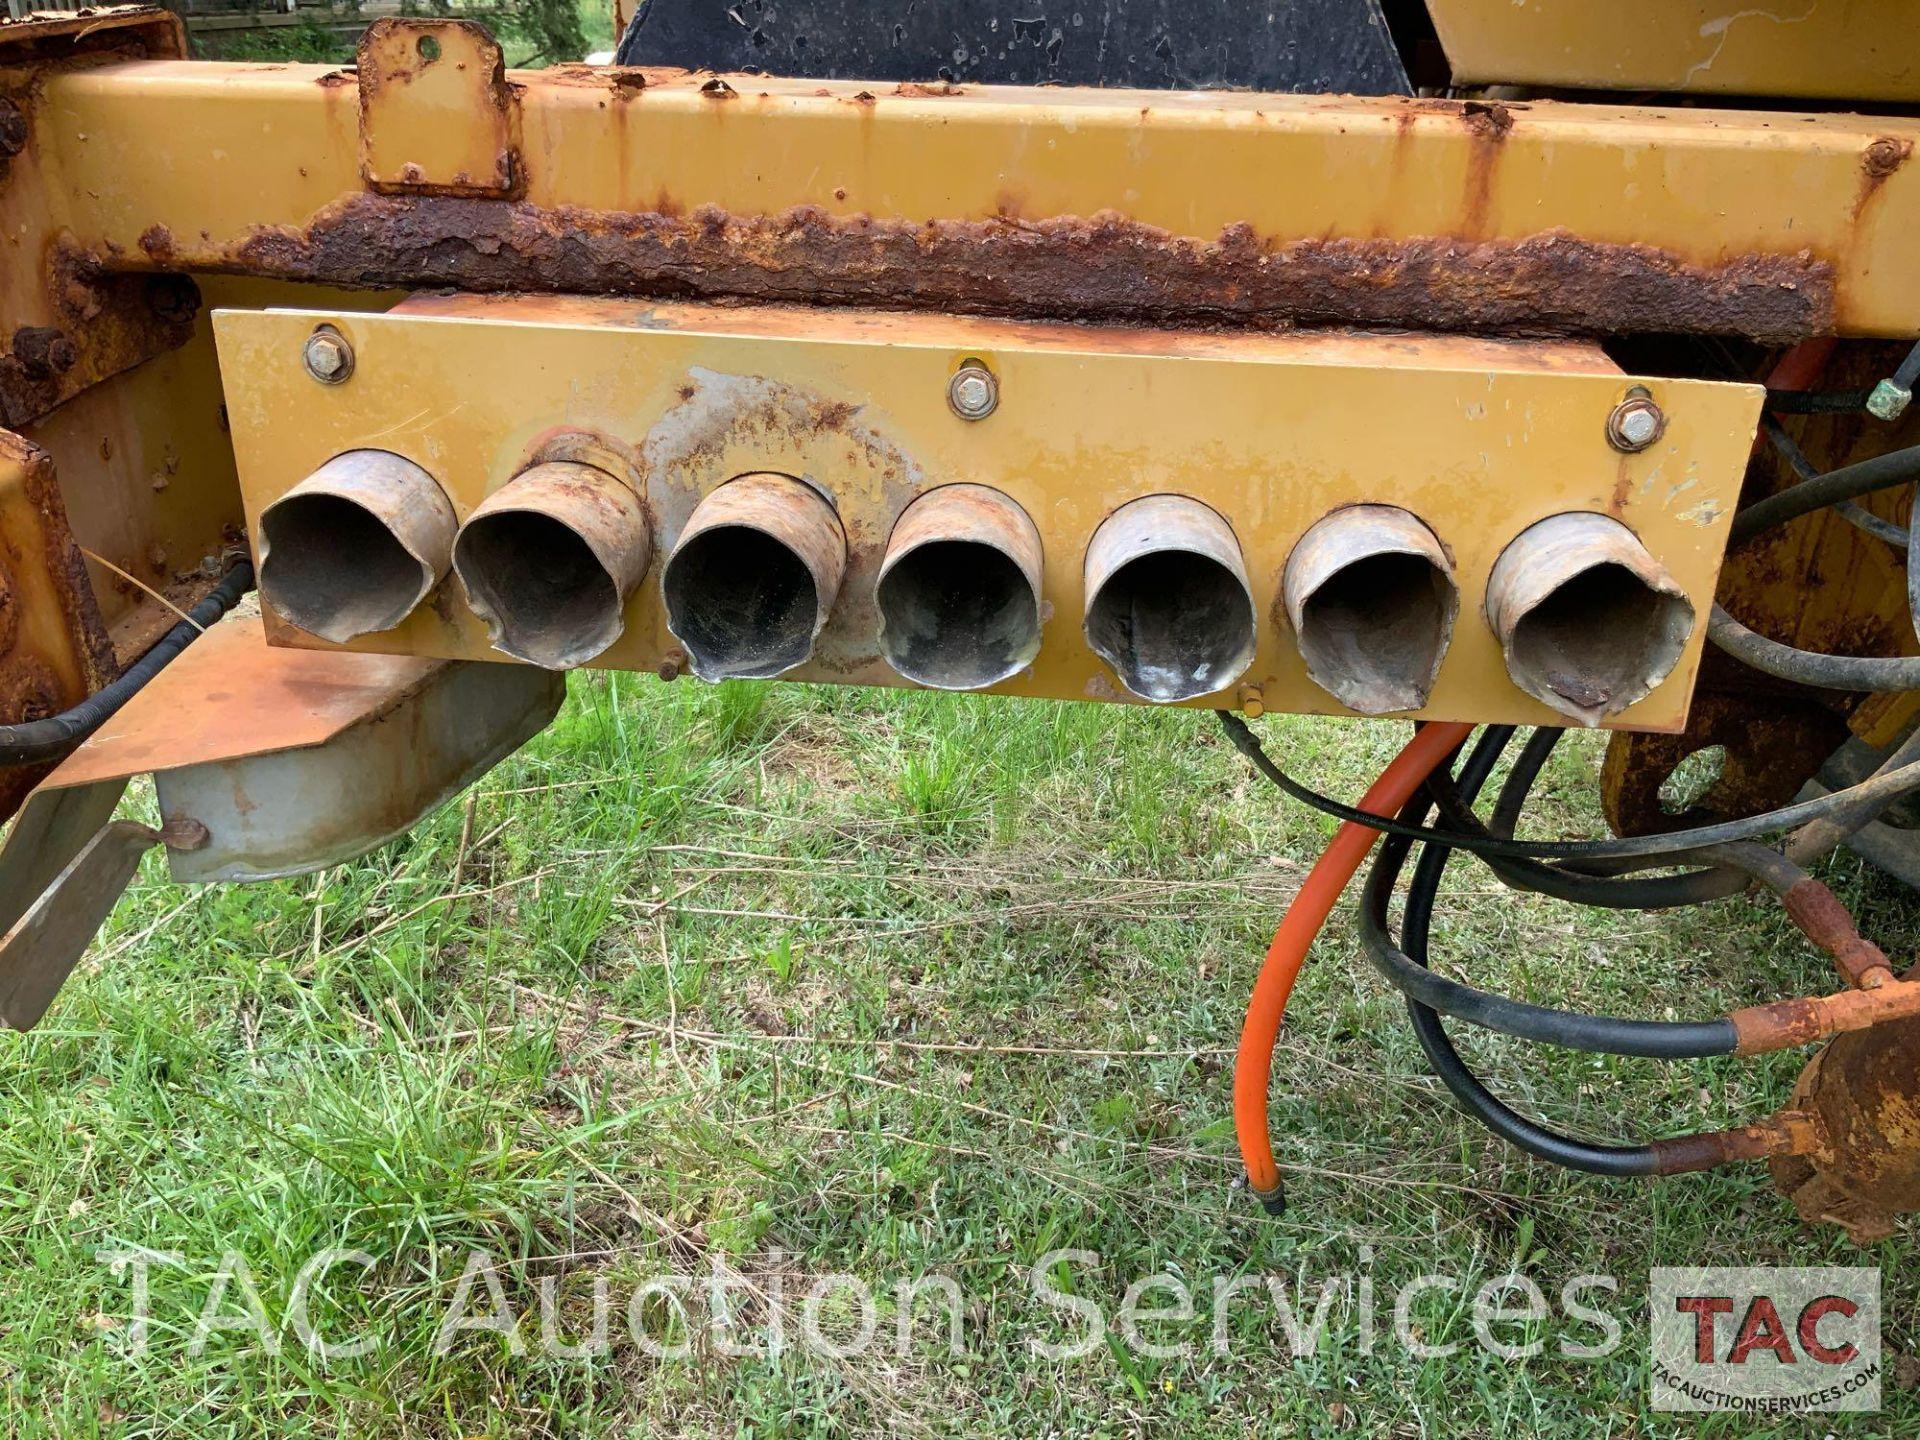 AirMax 1000 Dry Fertilizer Spreader - Image 13 of 30